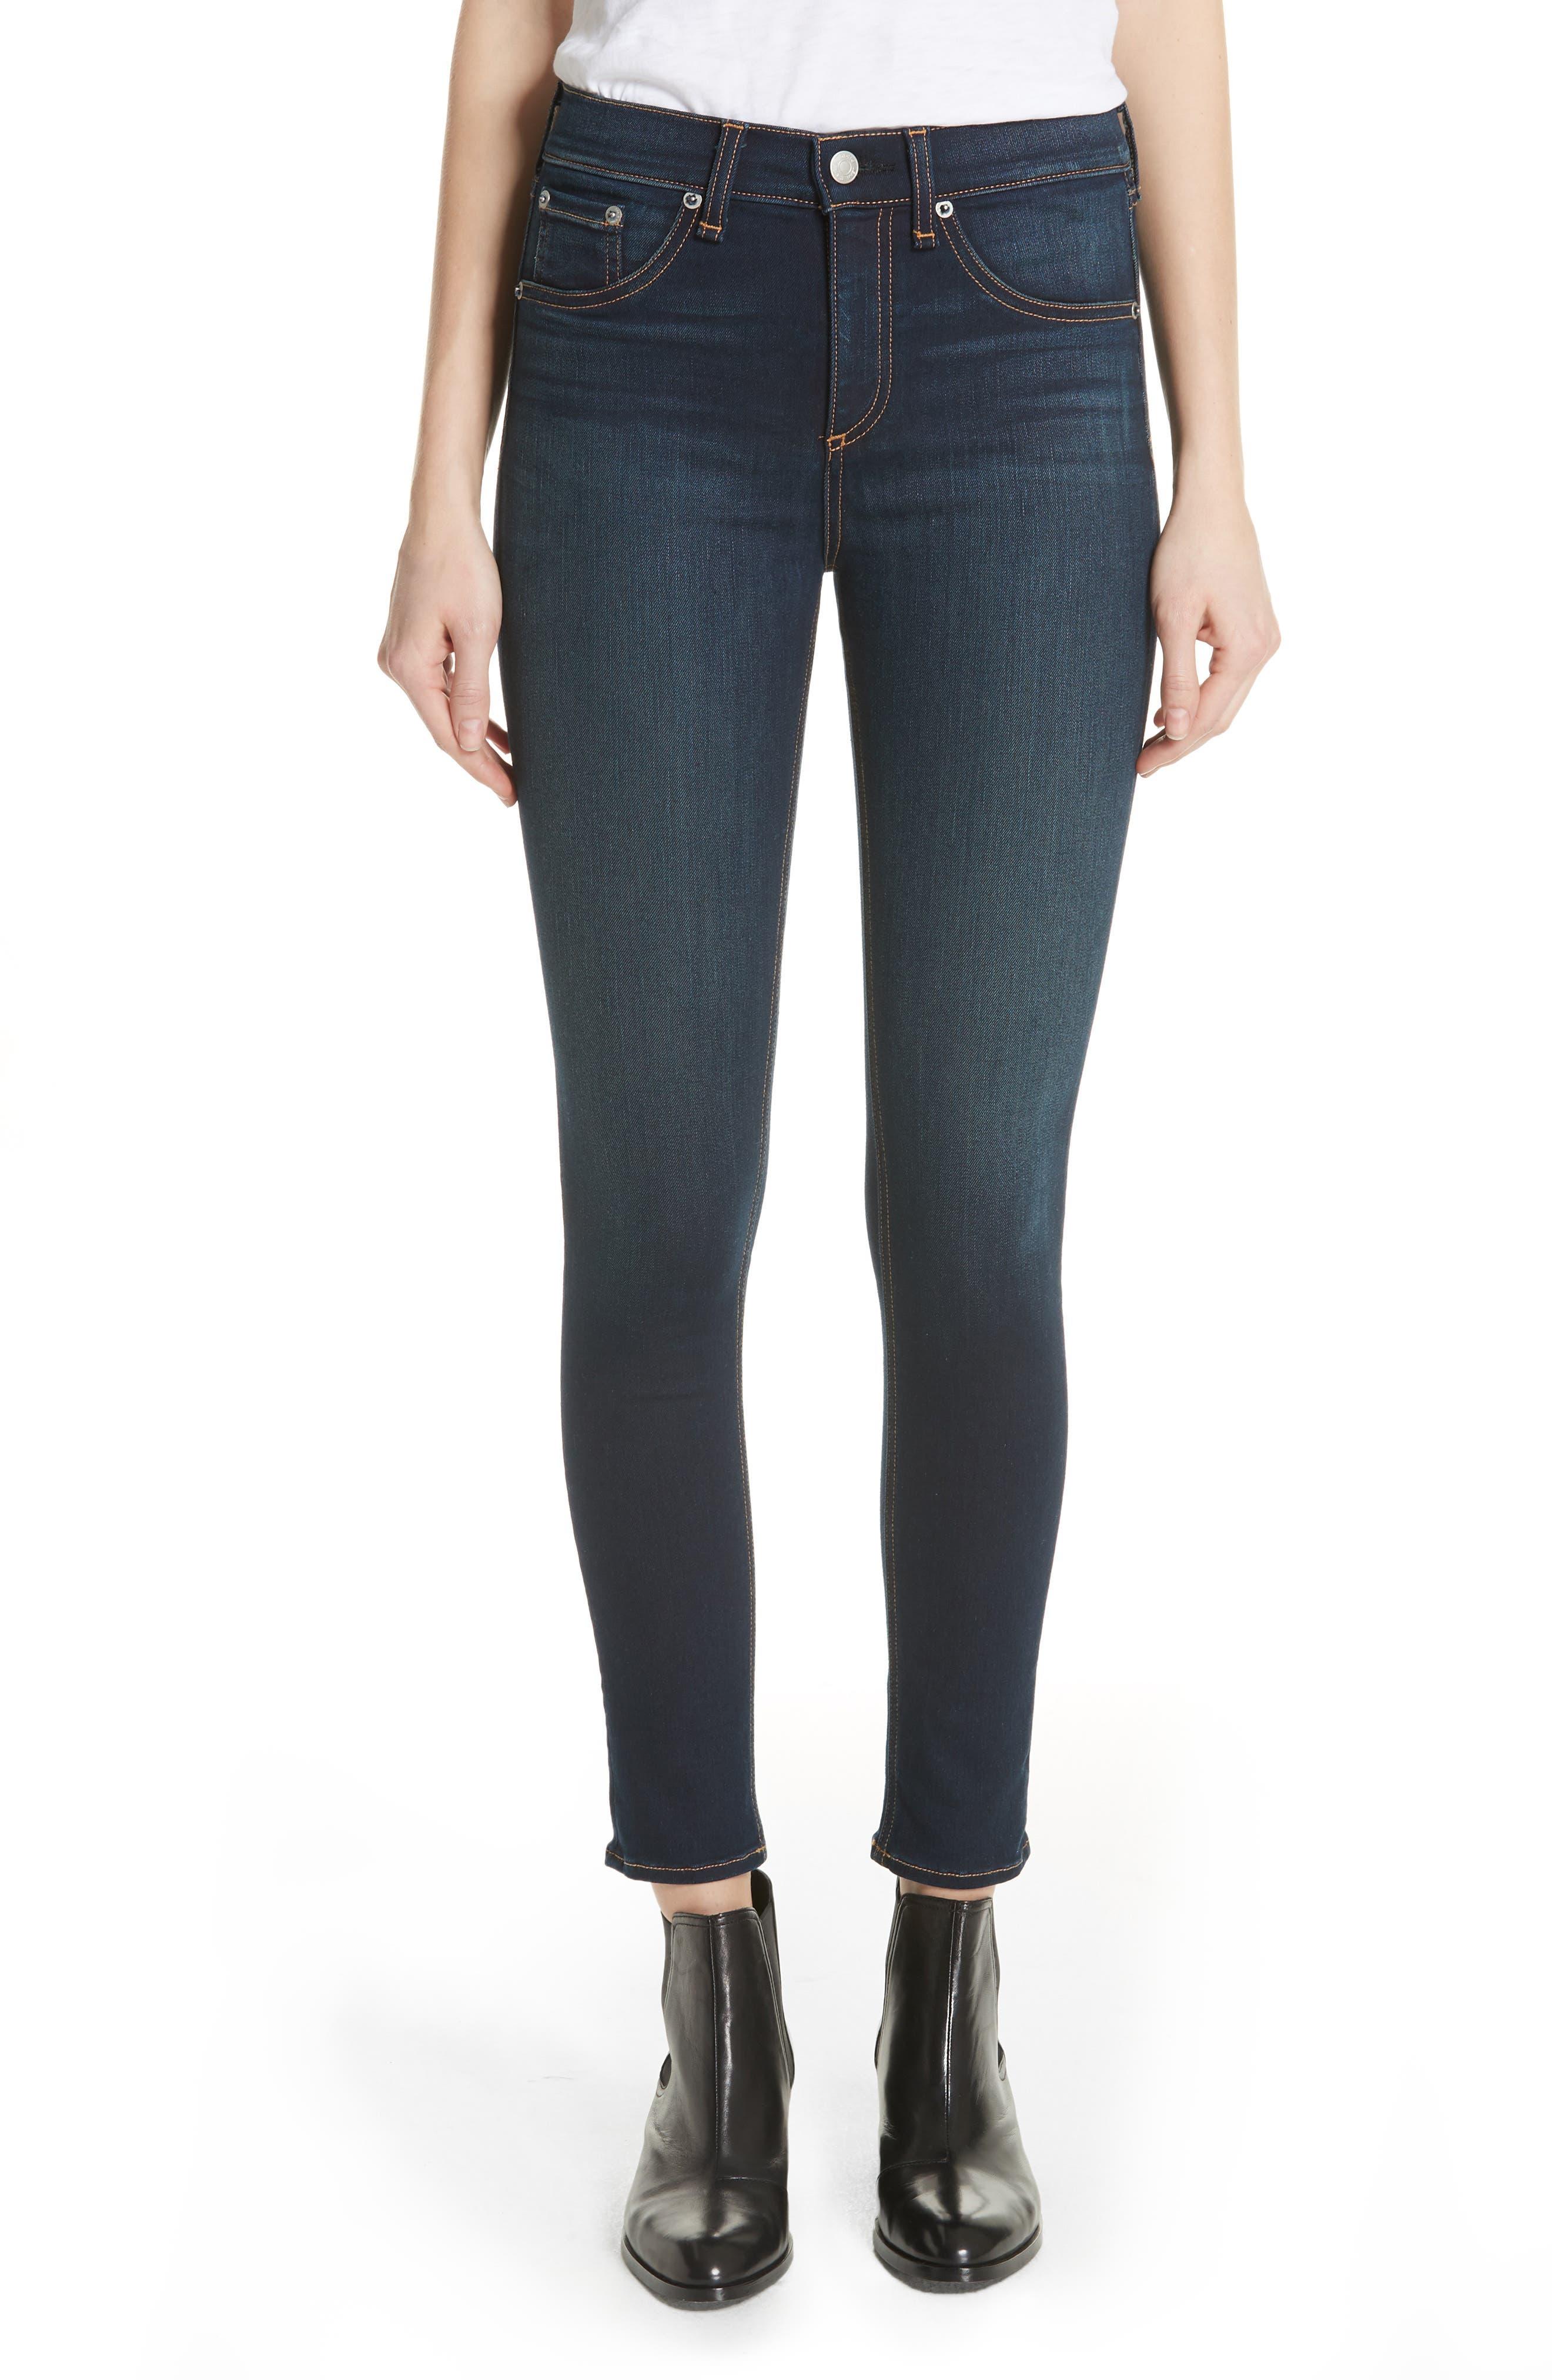 RAG & BONE, High Waist Ankle Skinny Jeans, Main thumbnail 1, color, BEDFORD